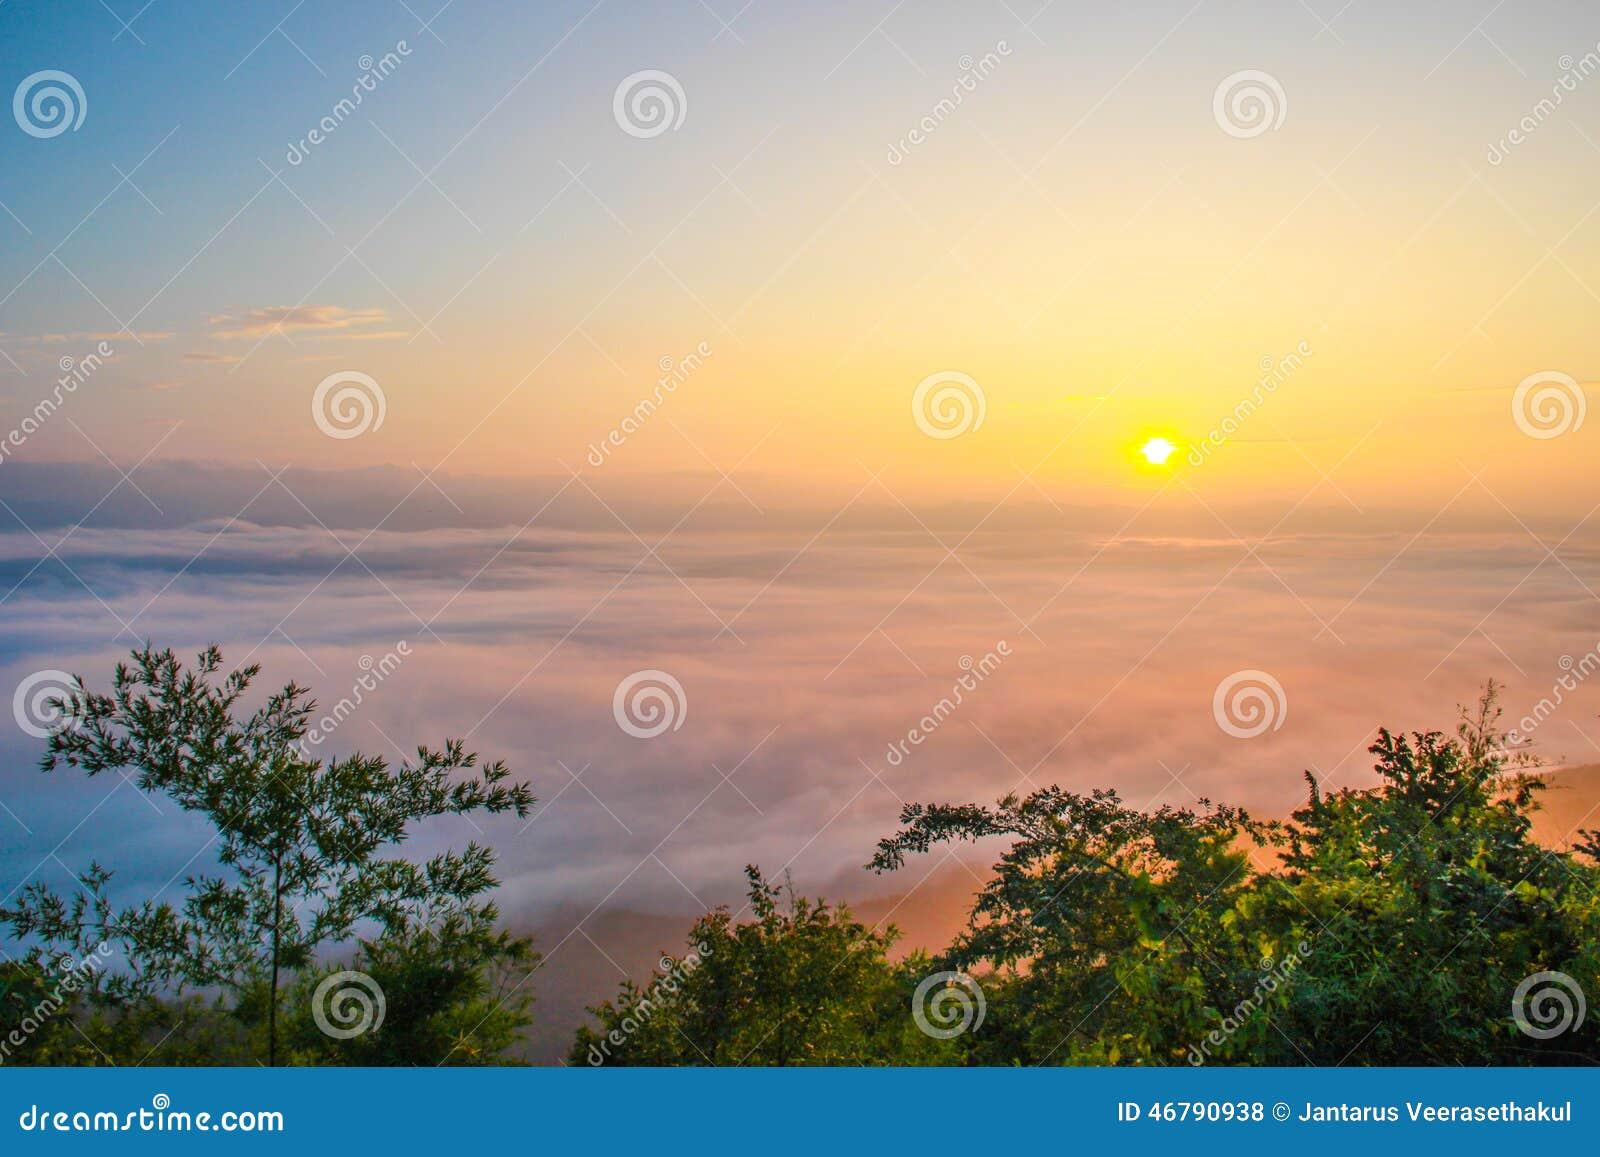 Overzeese mist, nan provincies - nan Thailand